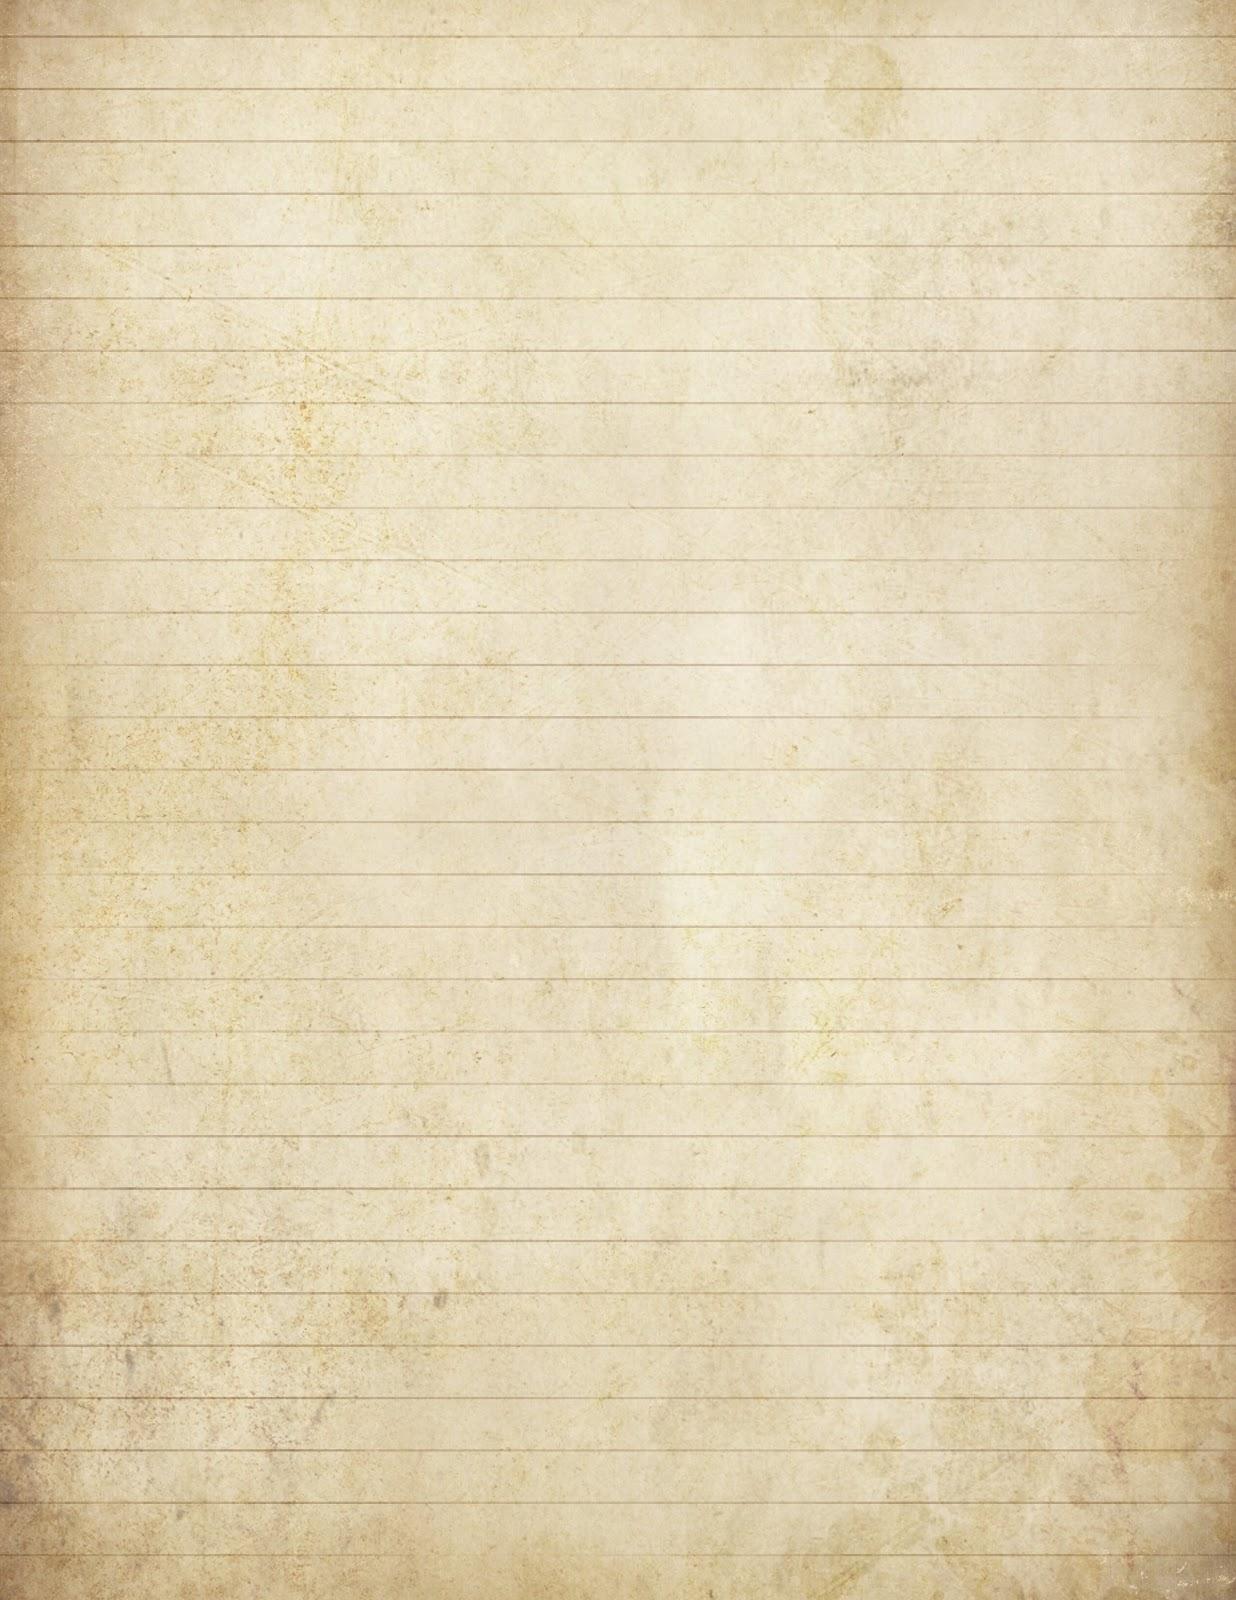 Old Letter clipart paper sheet Paper I  paper completing